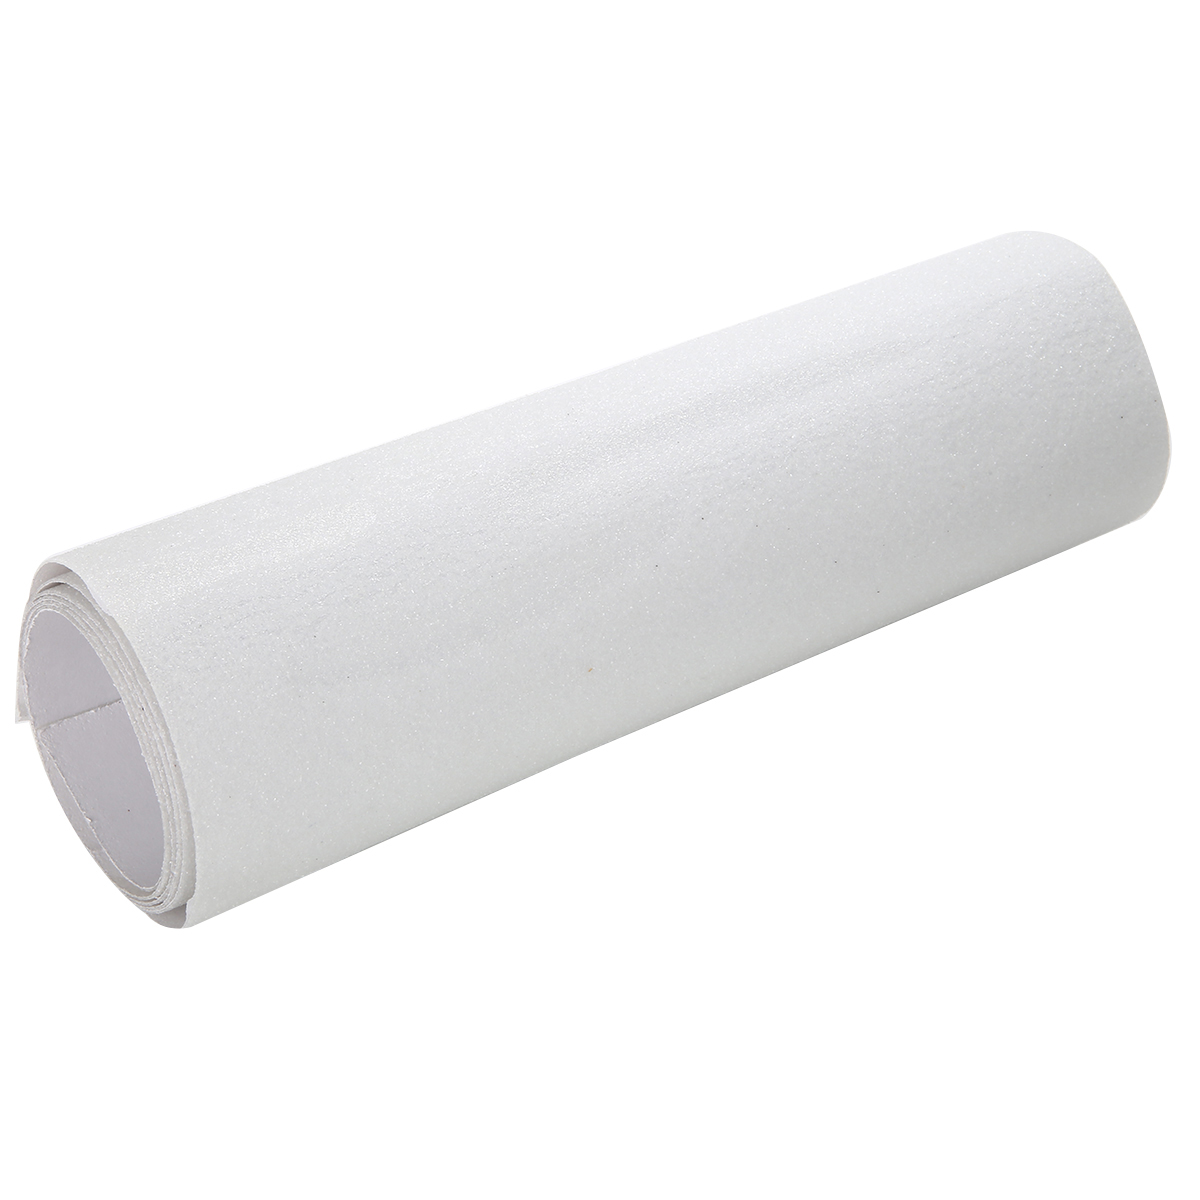 Skateboard /& Longboard Griptape Clear Transparent Aufkleber Griff Band 125*25cm